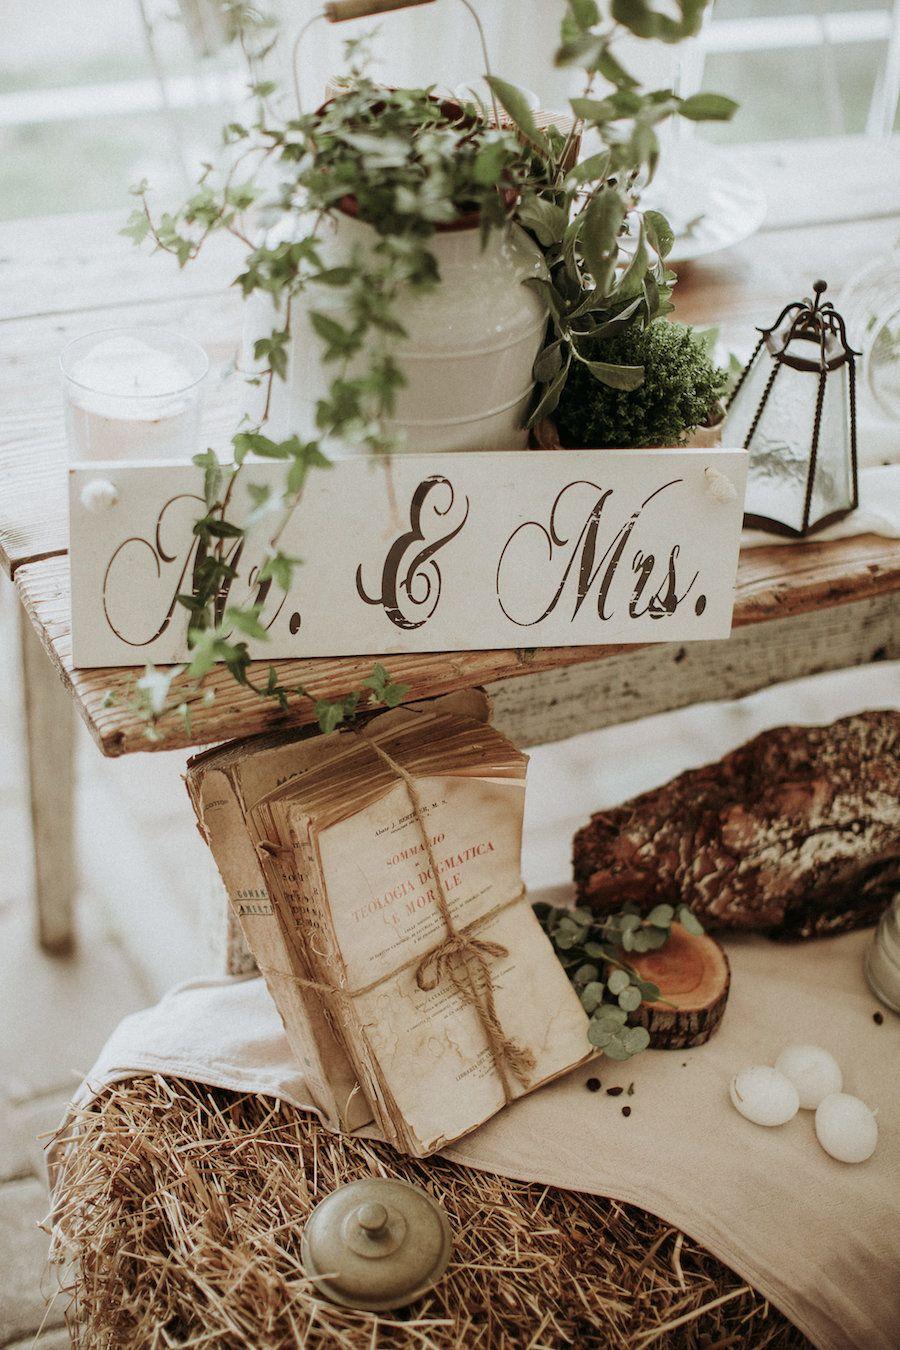 Matrimonio Rustico Como : Un matrimonio rustico e retrò wedding decor wedding decorations